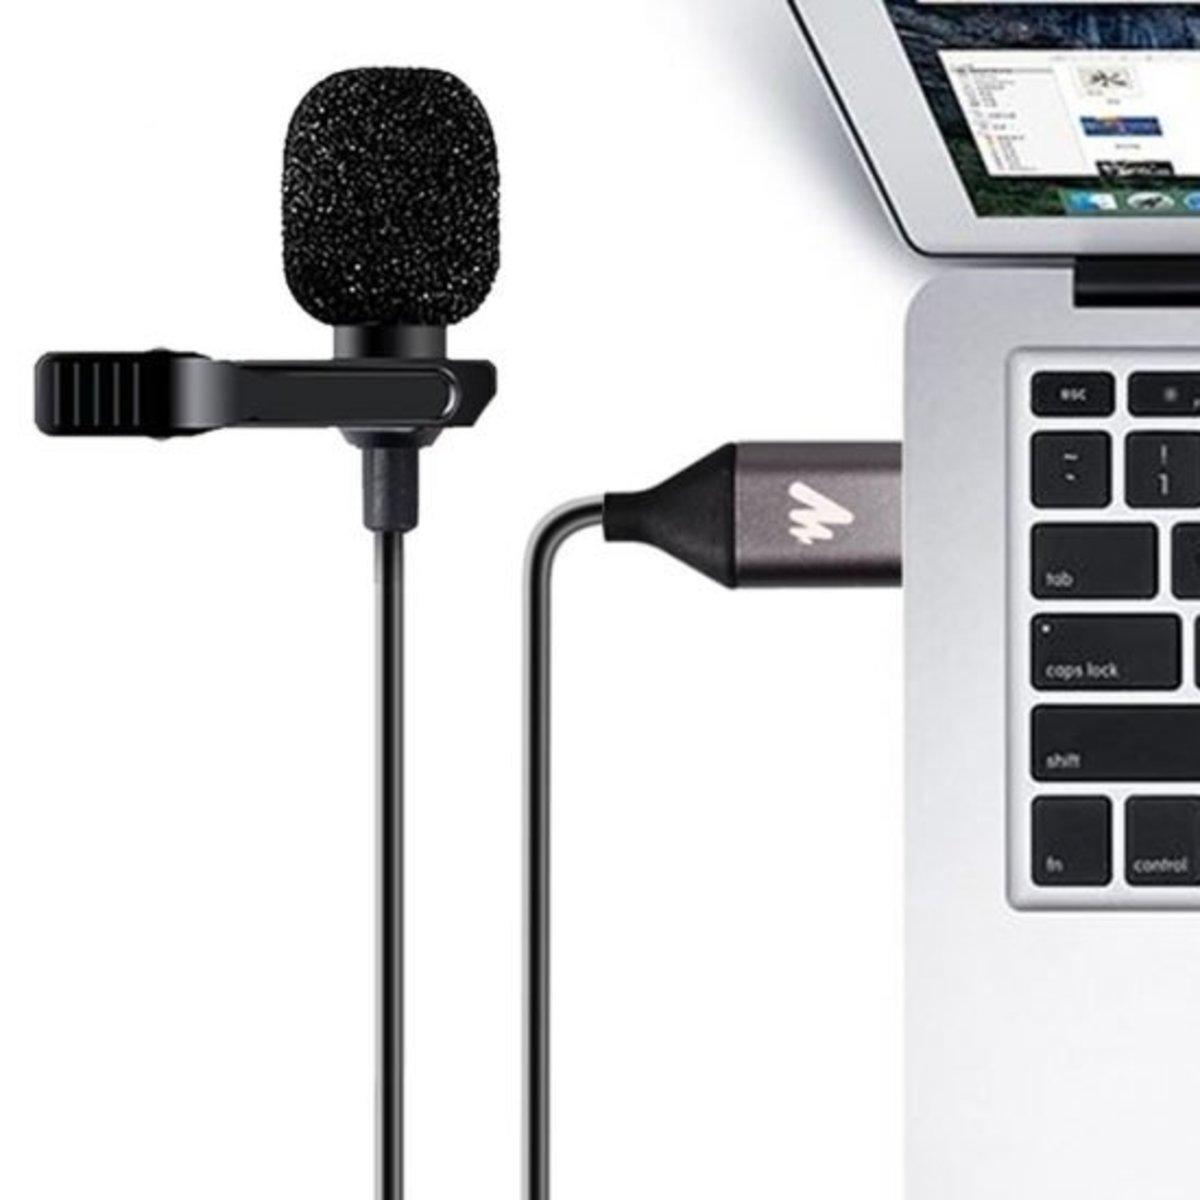 USB夾式電容咪[AU-410]